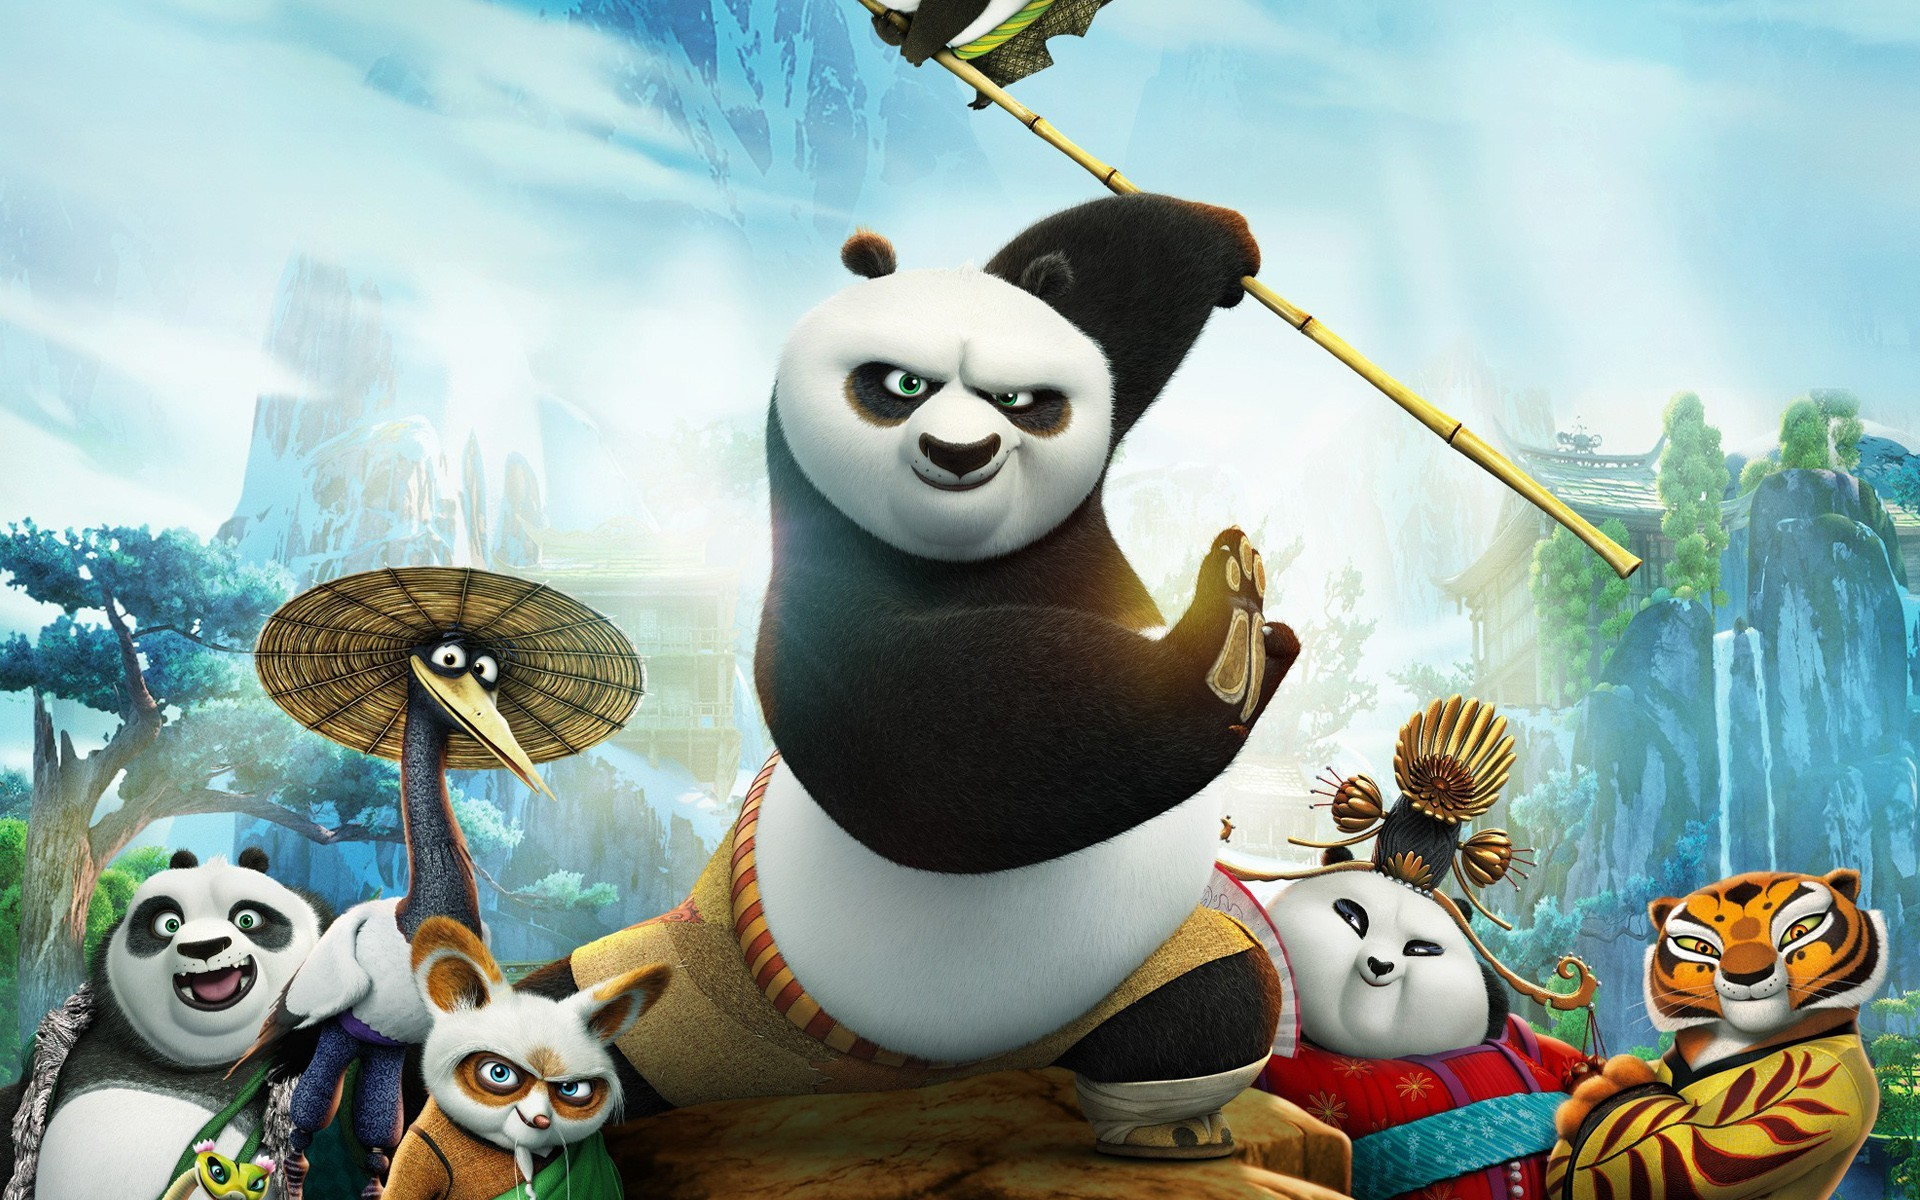 Kung fu panda 3 wallpapers wallpapertag - Kung fu panda wallpaper ...